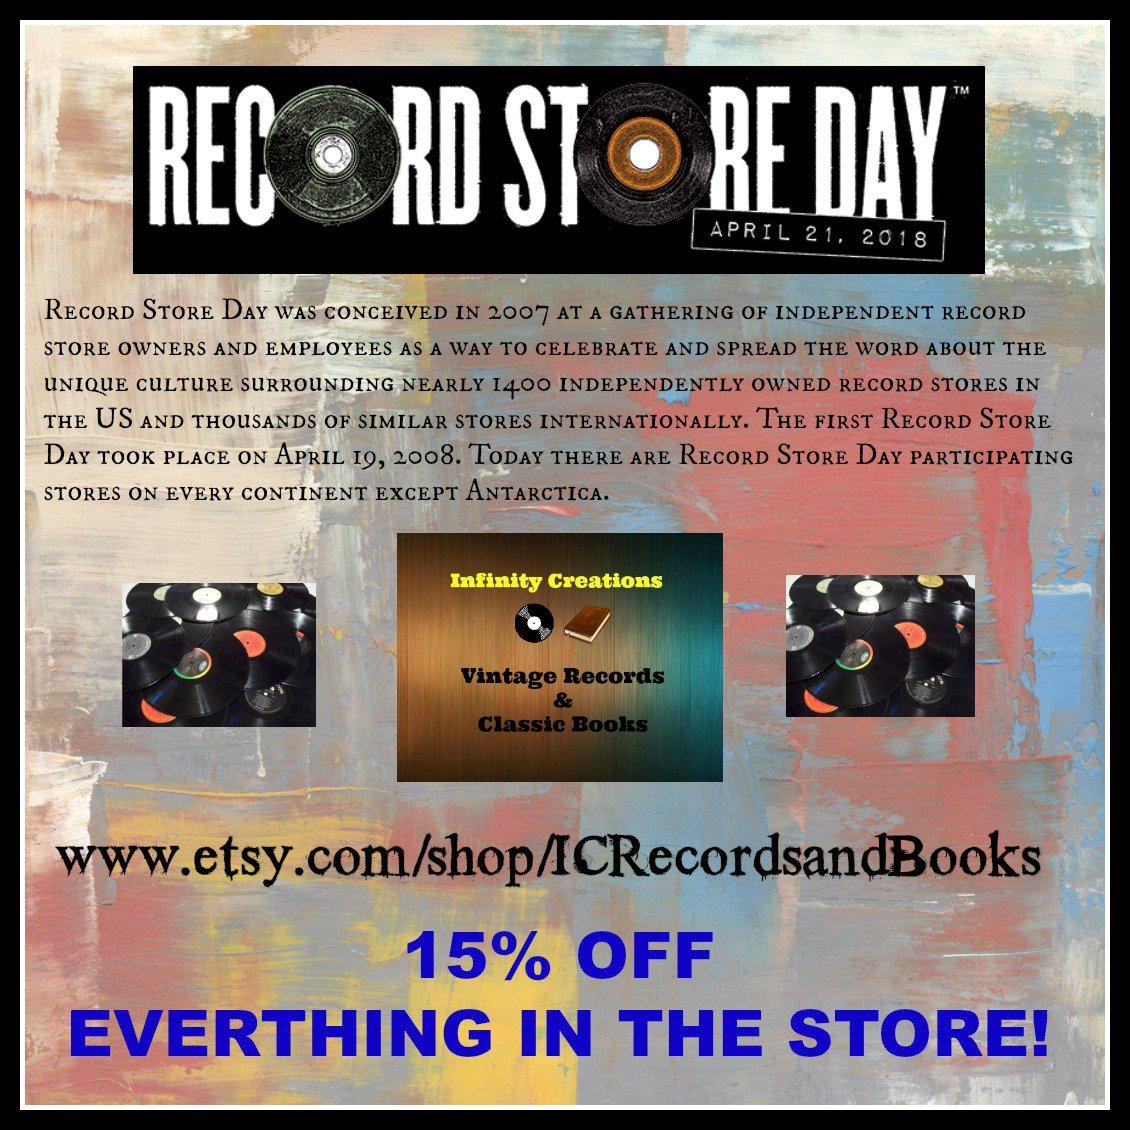 April 21st - Record Store Day!  https://www. etsy.com/shop/ICRecords andBooks &nbsp; …   #RecordStoreDay #recordstoreday2018 #records #recordstore #VintageRecords #ClassicVinyl #vinylrecords #vinylcollection #45rpm #33LP #Music #CountryMusic #RockandRoll #Jazz #Soundtracks #Sale #RandB #PopMusic #EasyListening<br>http://pic.twitter.com/6OvI7F3eMF